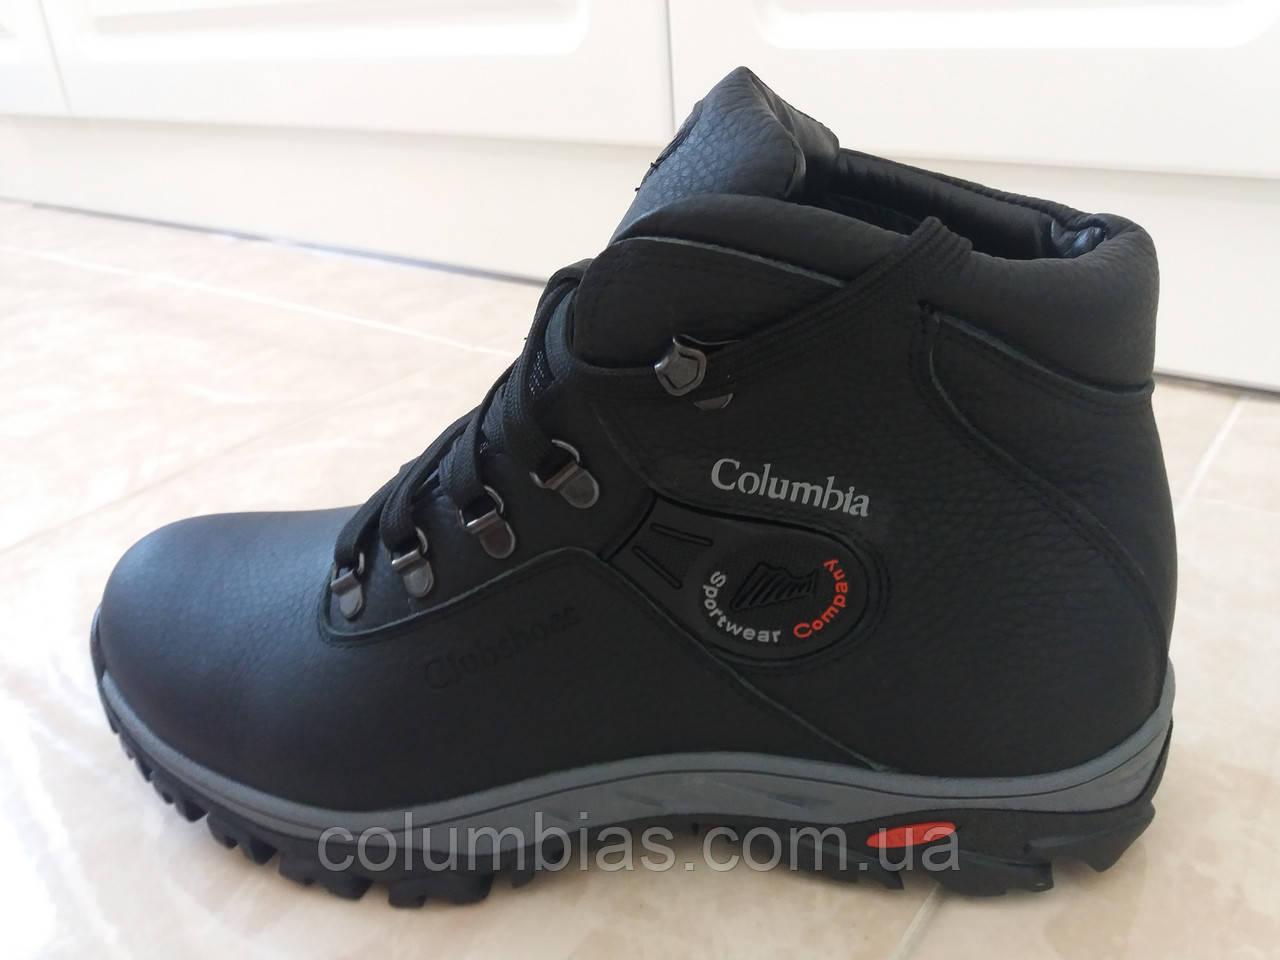 Ботинки Collumbia men